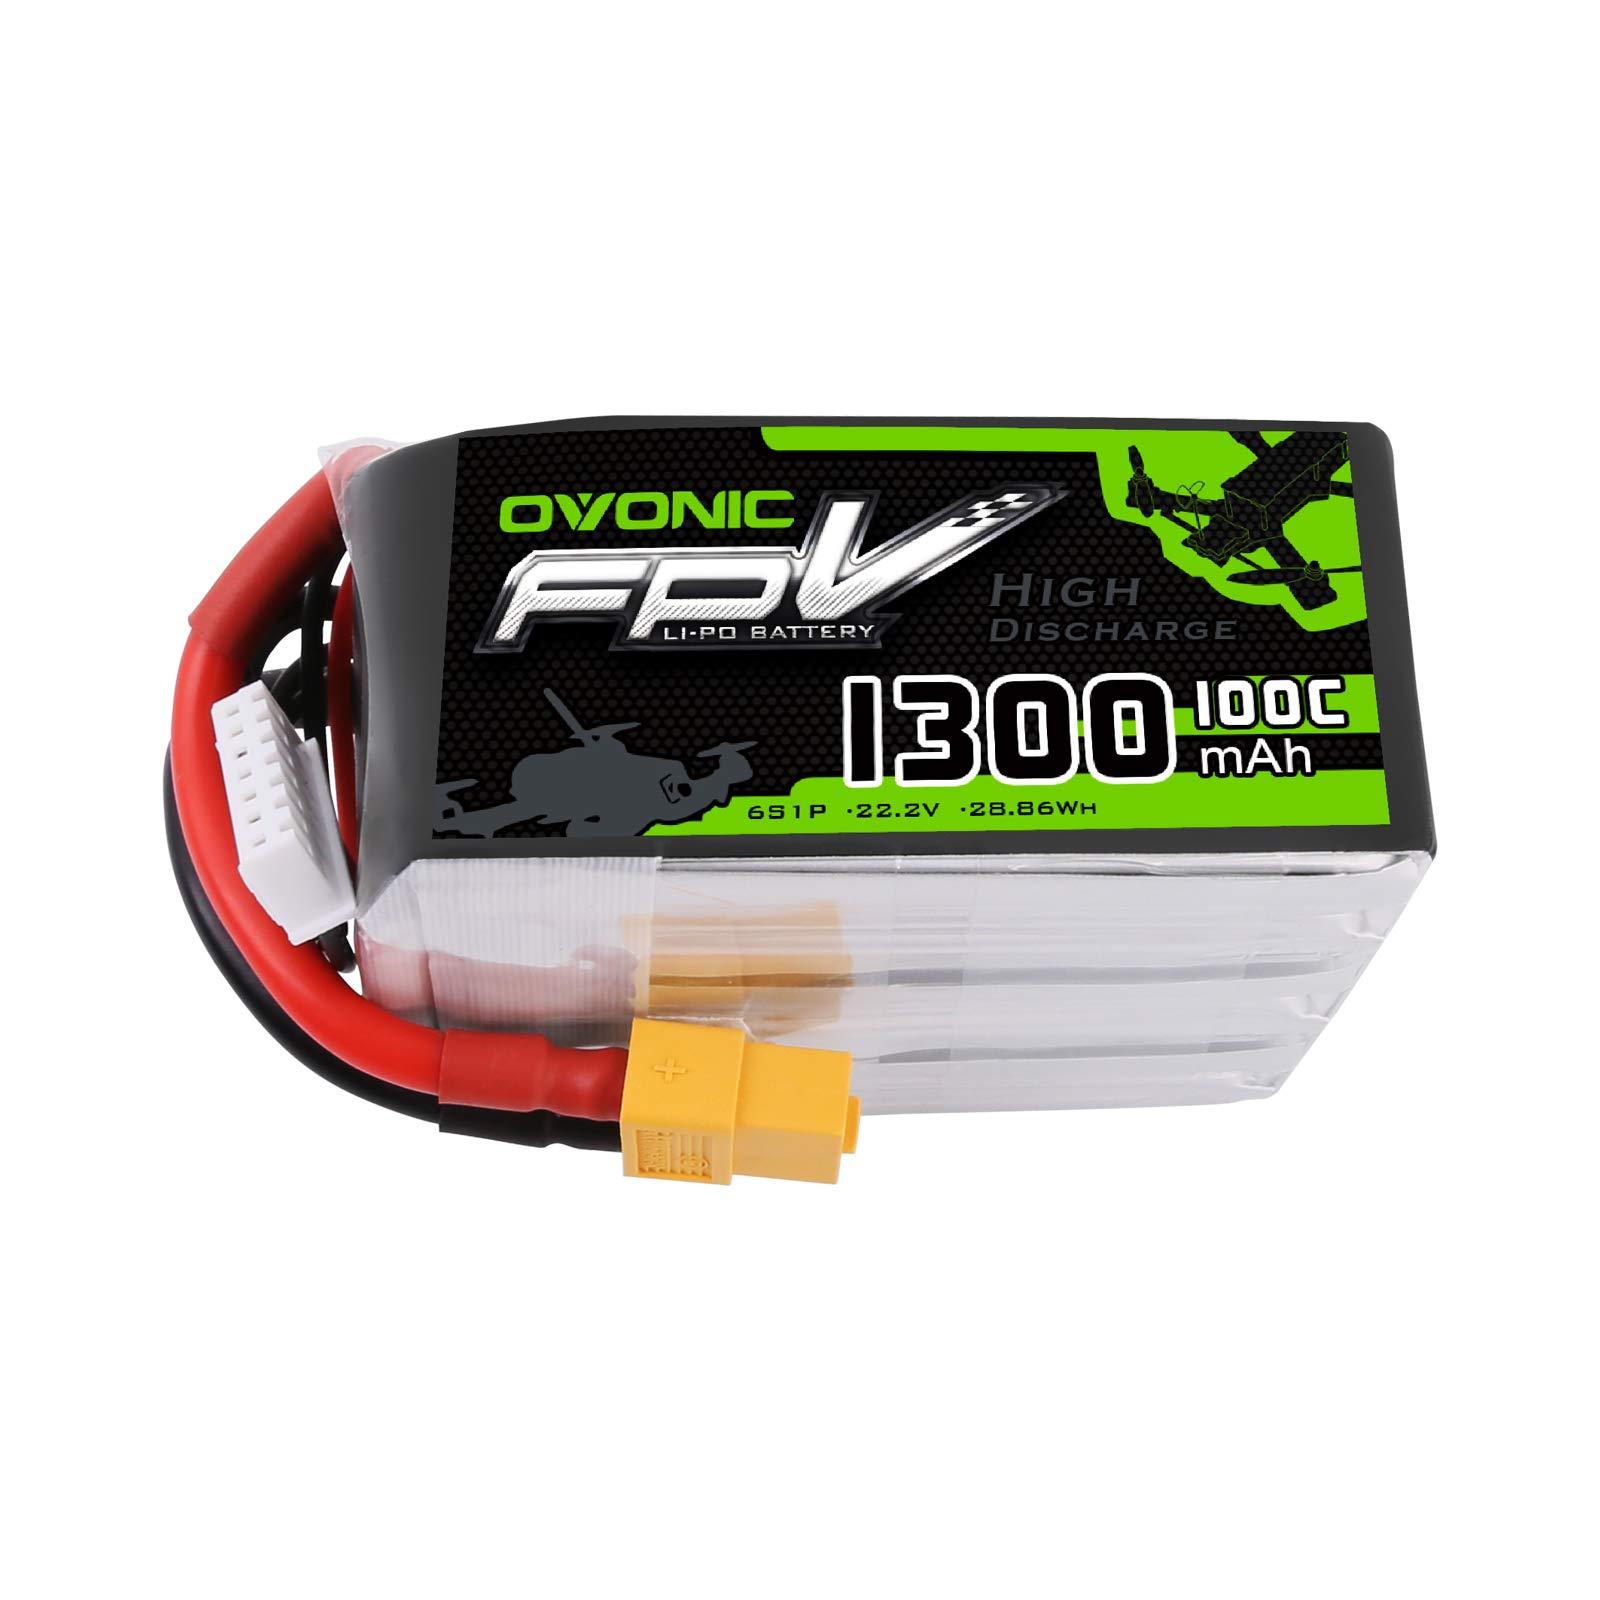 Ovonic 1300mAh 22.2V 6S 100C Lipo Battery with XT60 Plug for FPV Racing